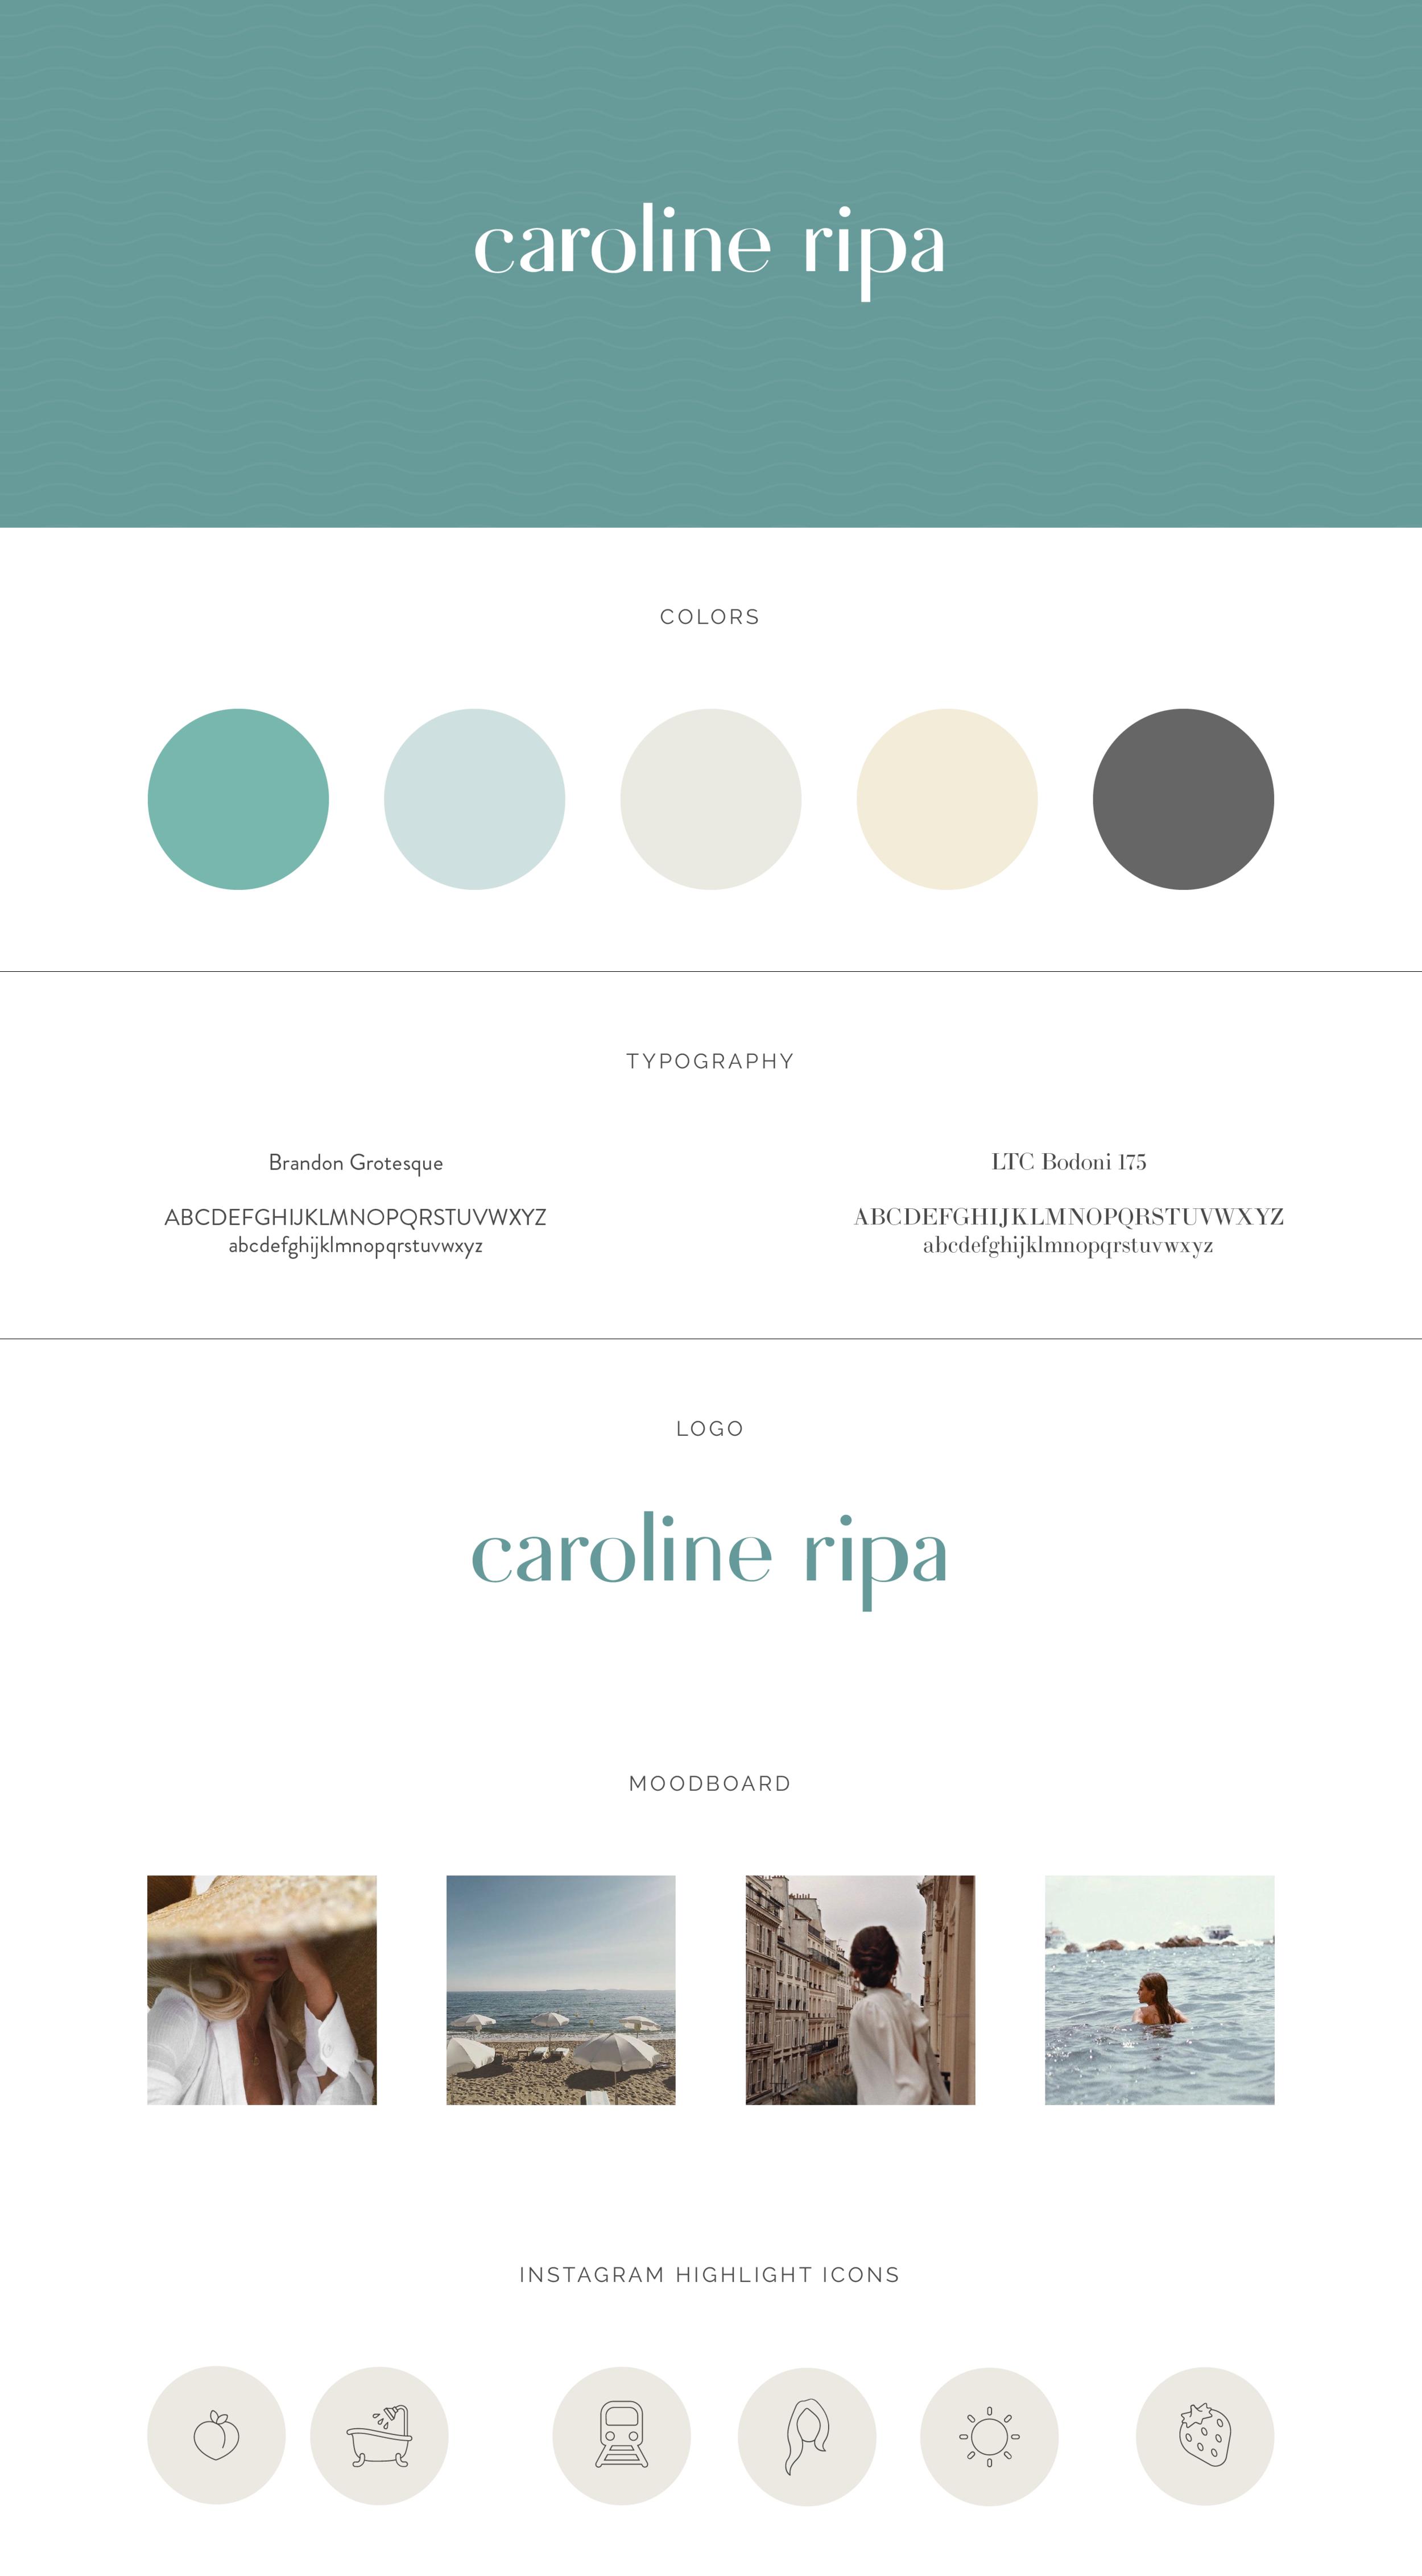 caroline-ripa-brand-board-2Artboard 1@2x.png